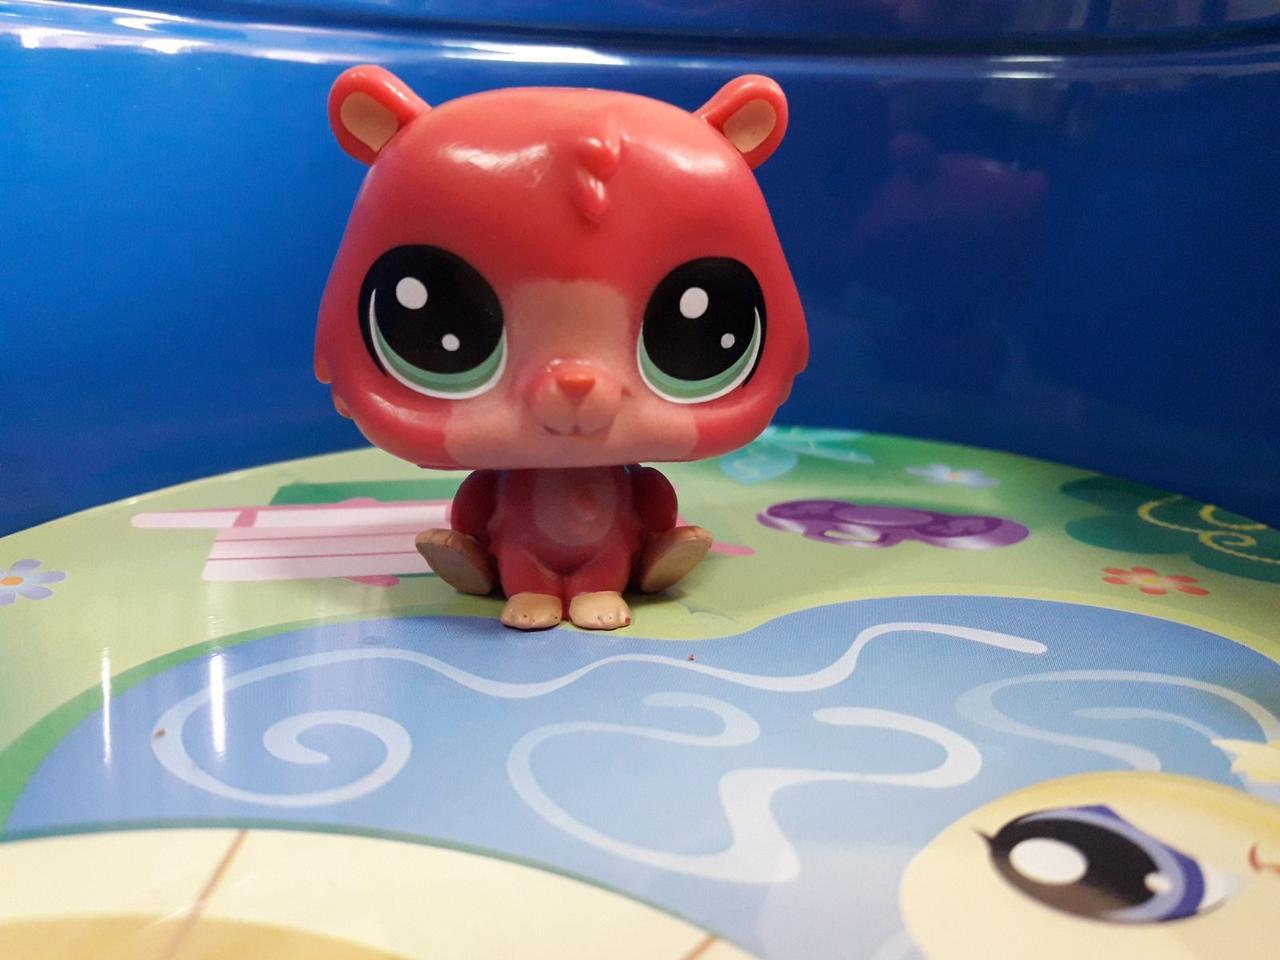 Littlest pet shop lps игрушка Hasbro лпс пет шоп хомяк